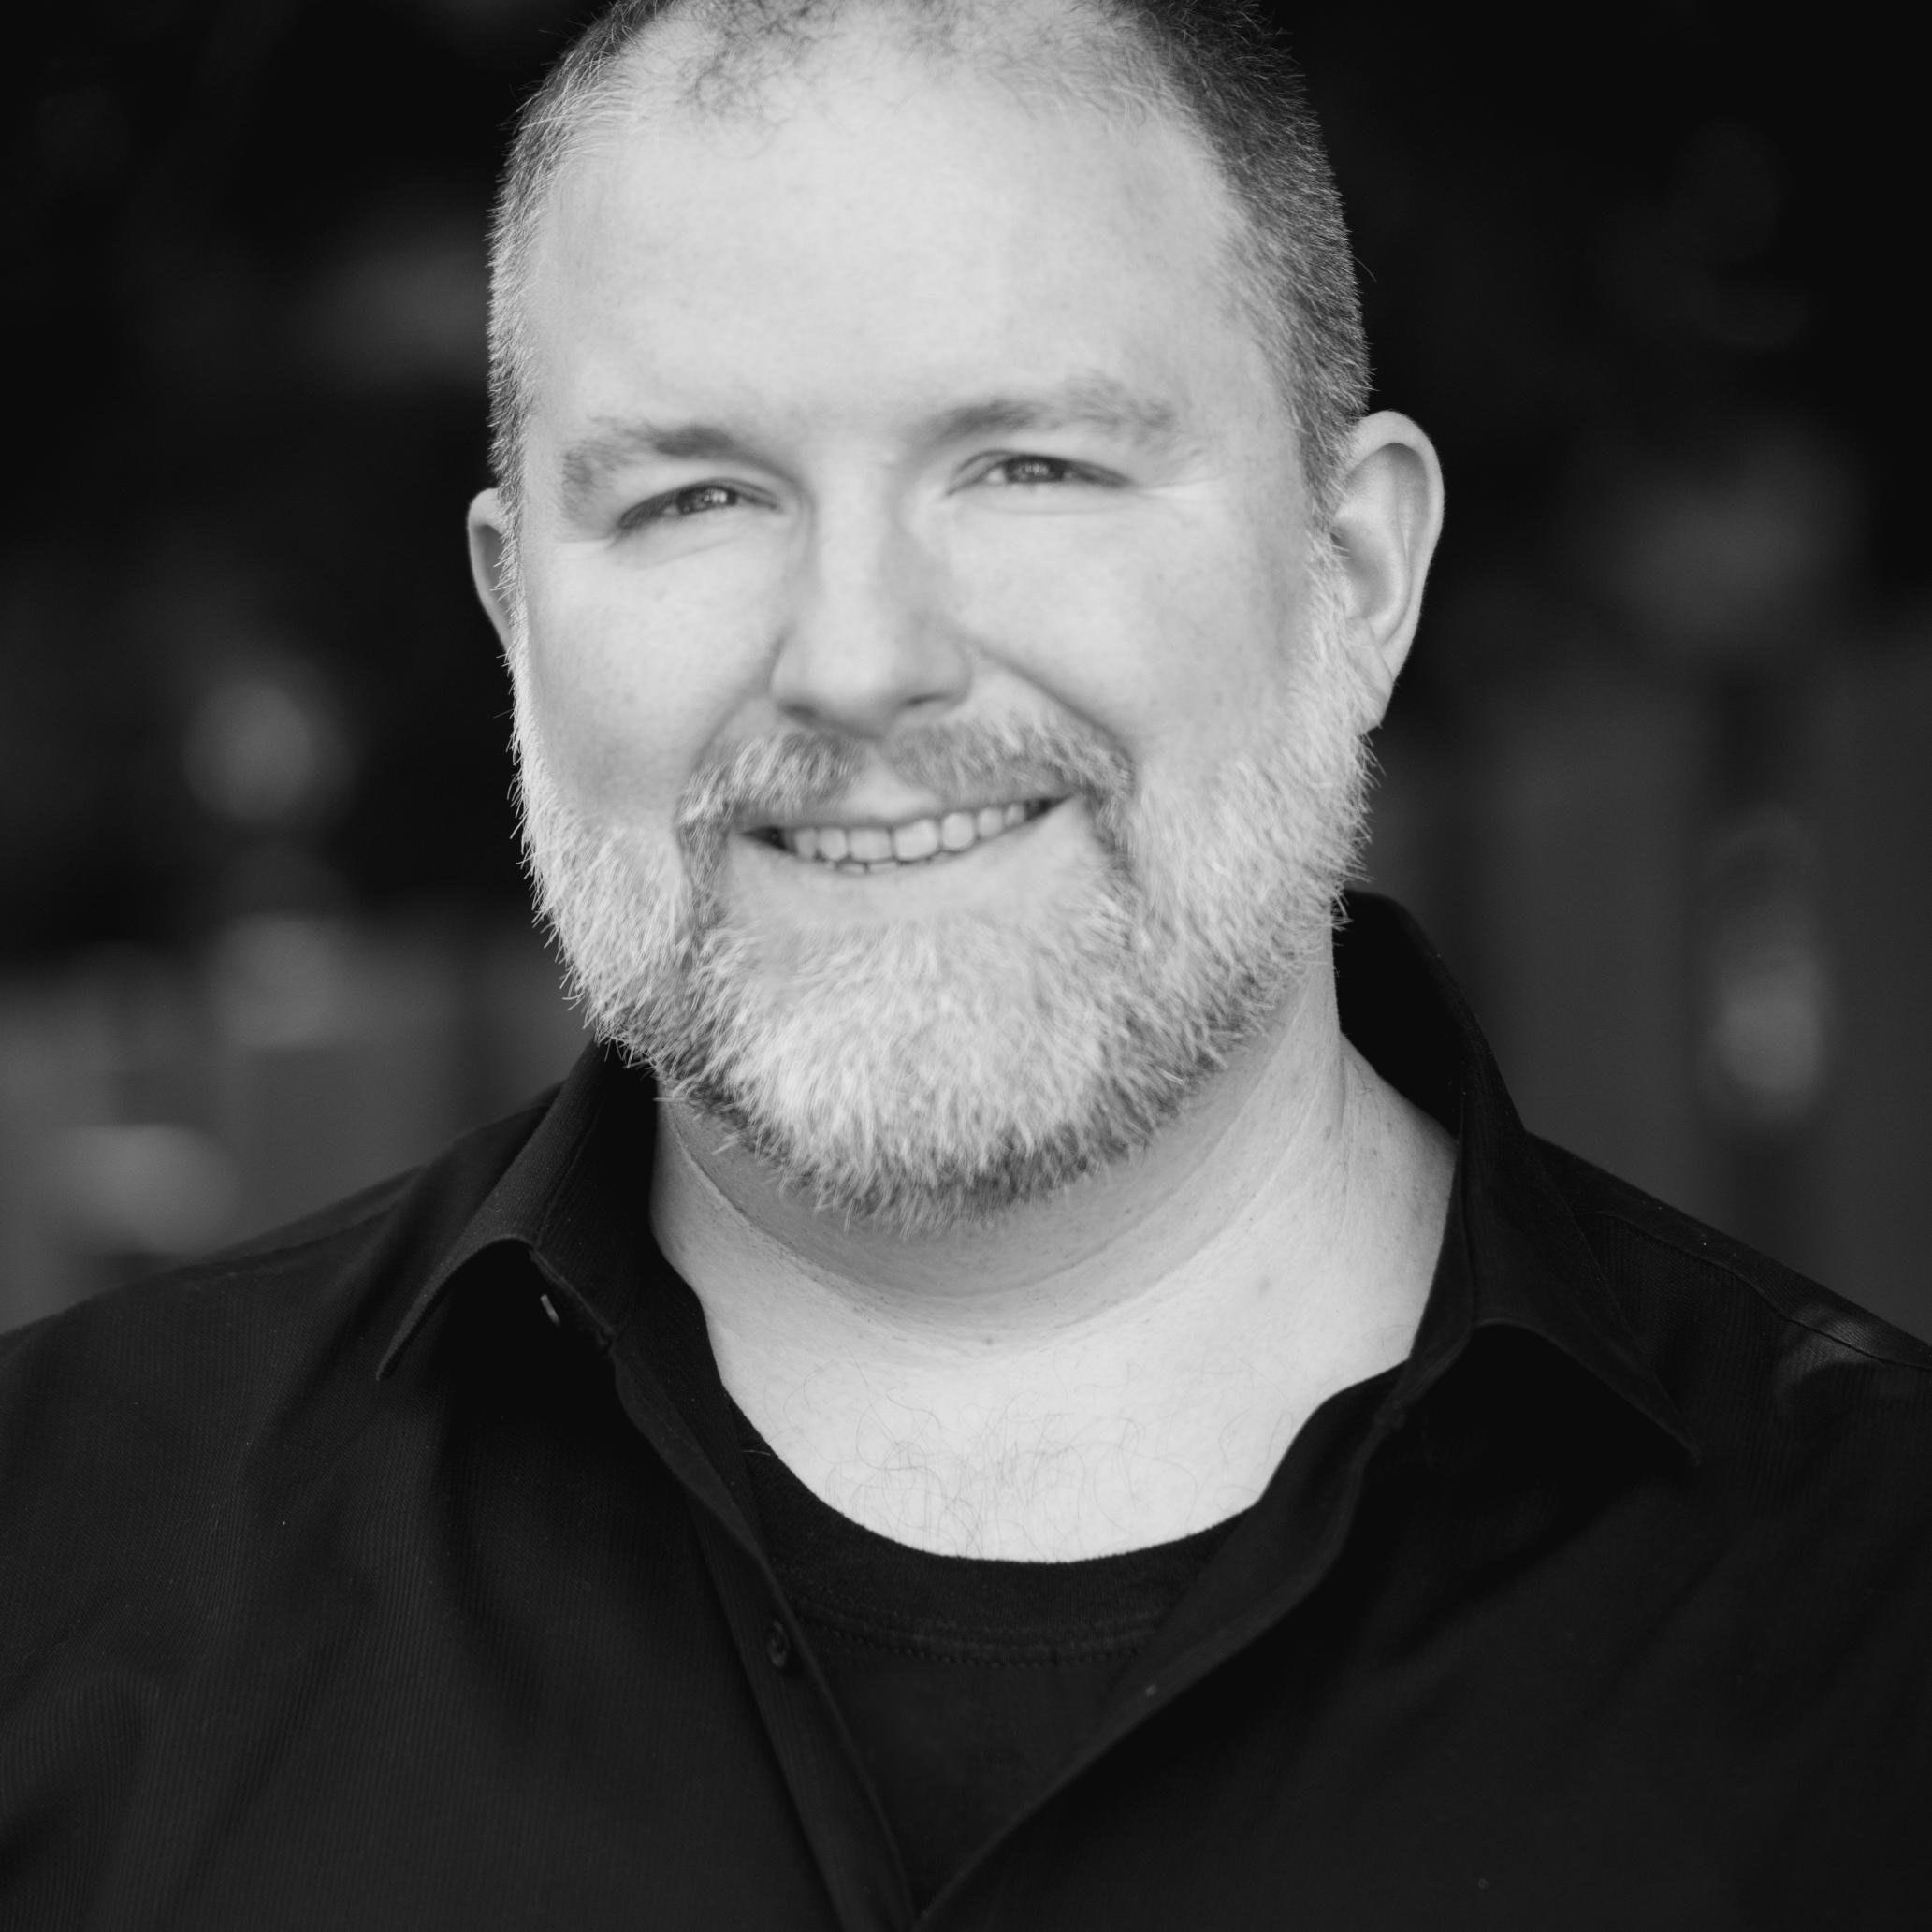 Greg Bledsoe